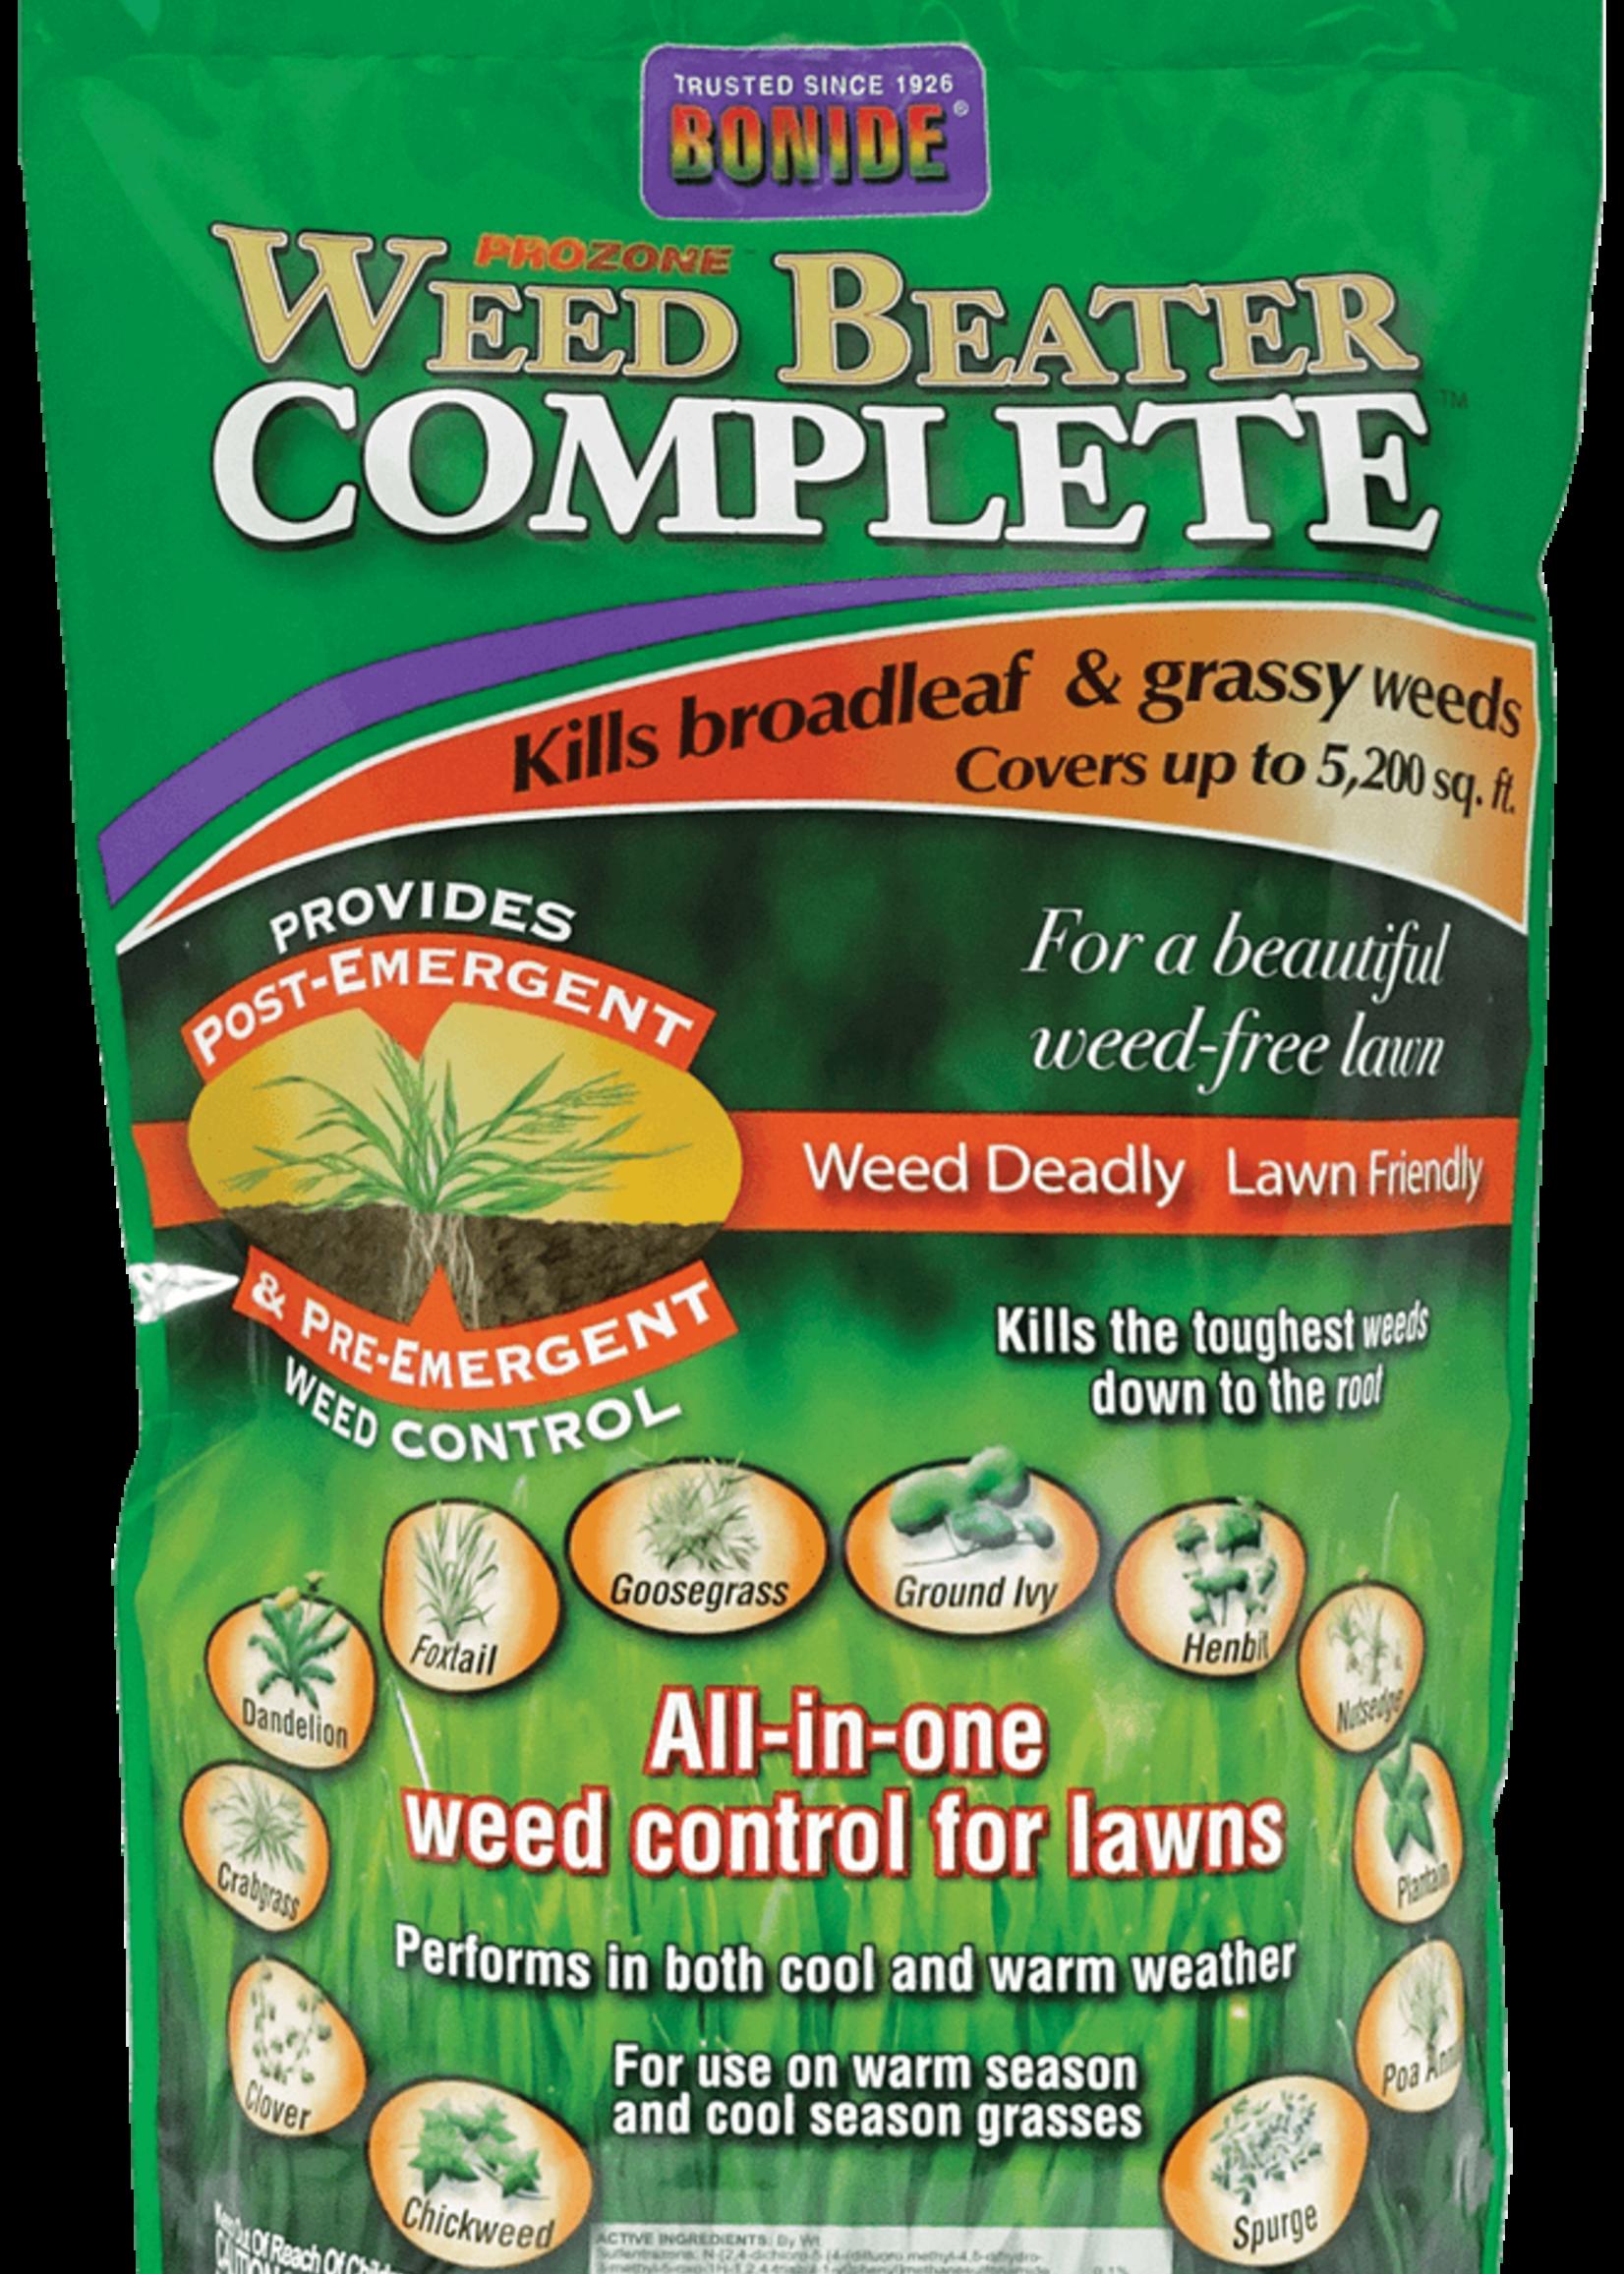 BONIDE Weed Beater Complete 10# bag 2200 sf